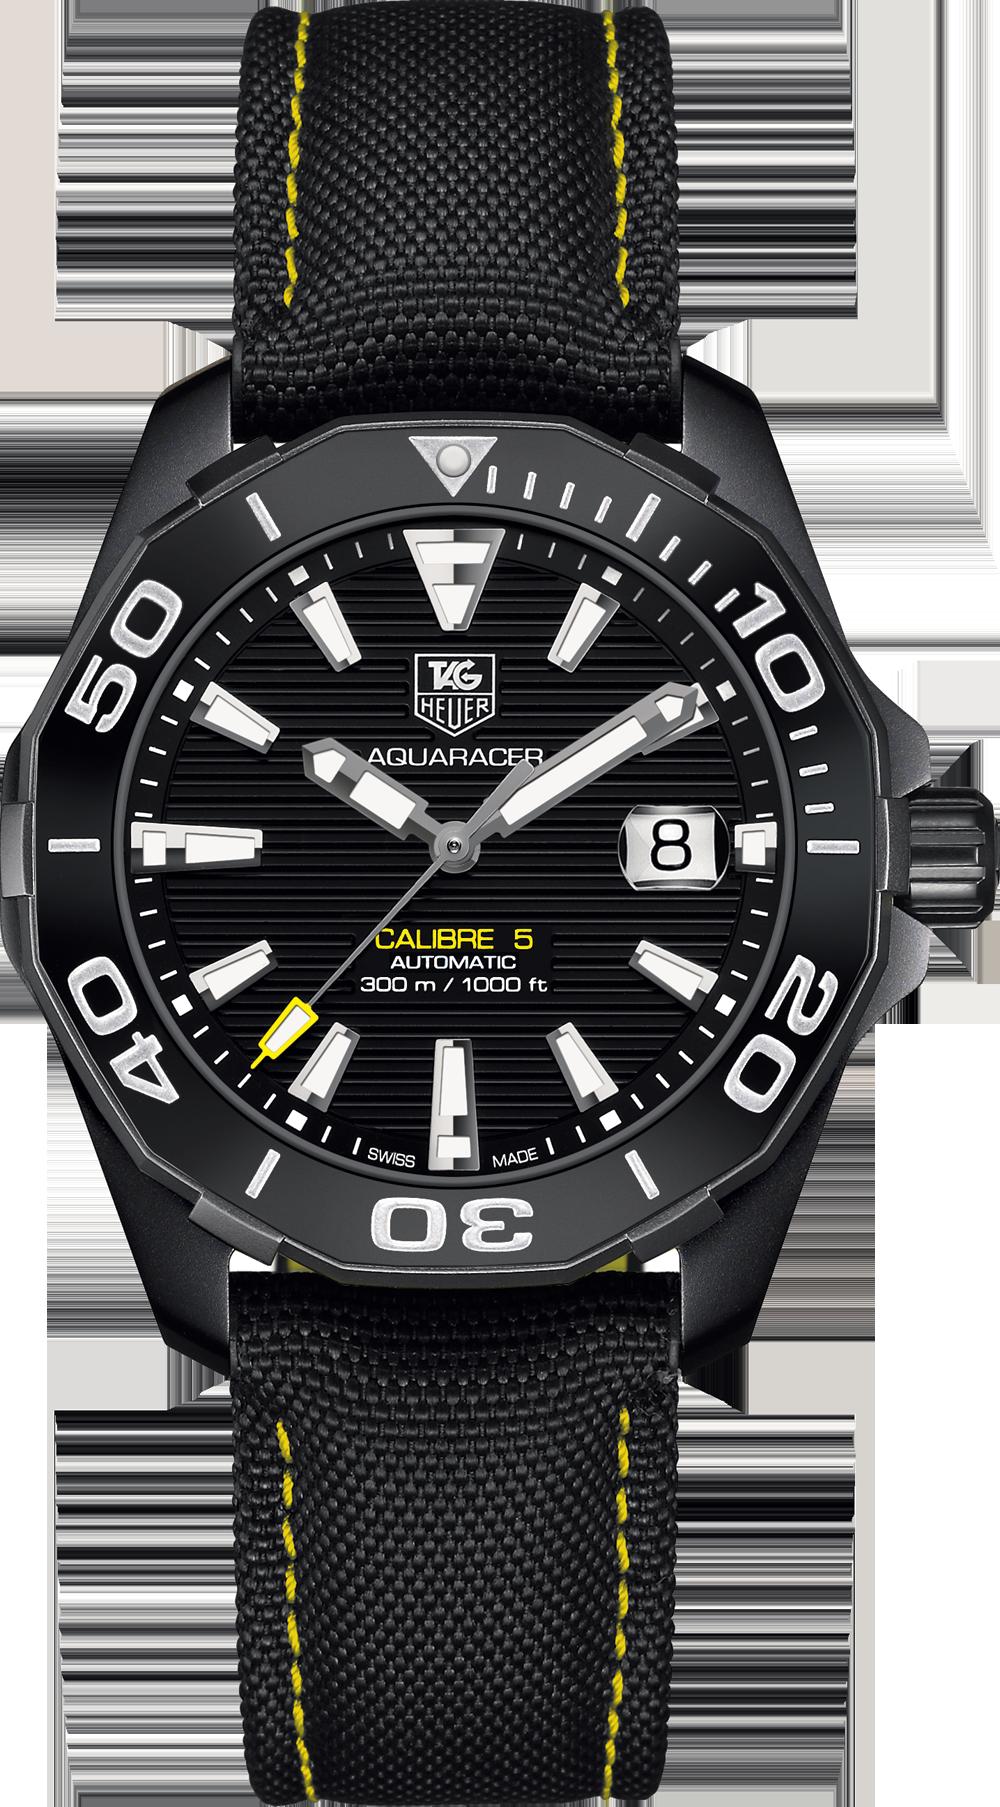 6316b25e683 Aquaracer 300M Calibre 5 Black version 41 mm Steel bracelet